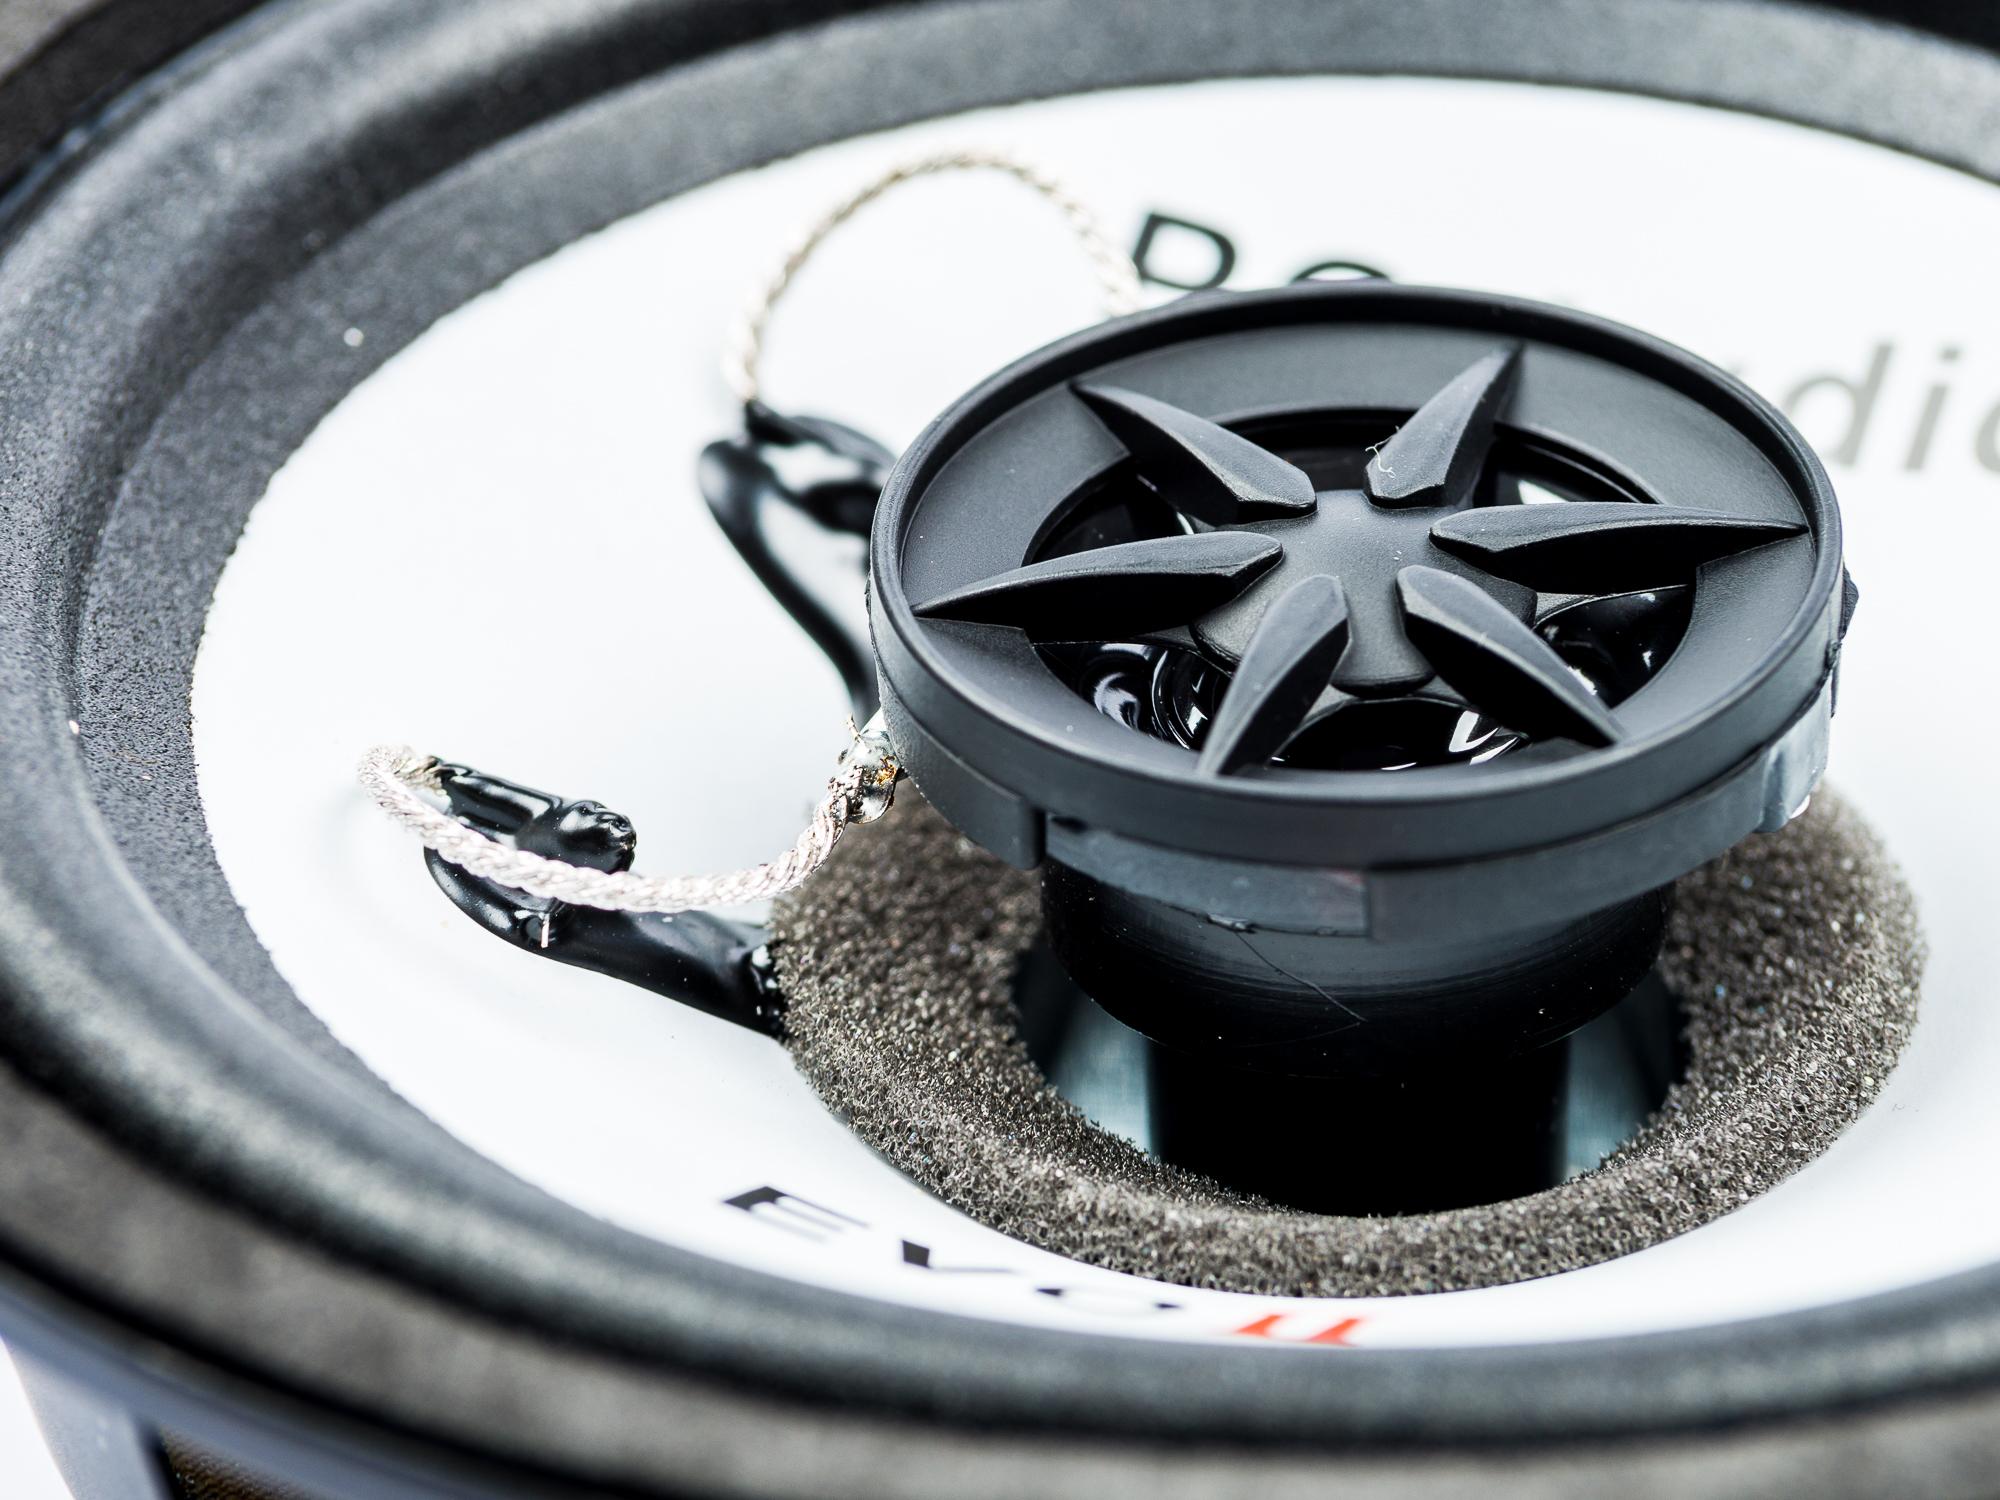 VW Scirocco Seat Mii Skoda Fabia Skoda City go Lautsprecher Einbauset Tür vorne PG Audio – Bild 4